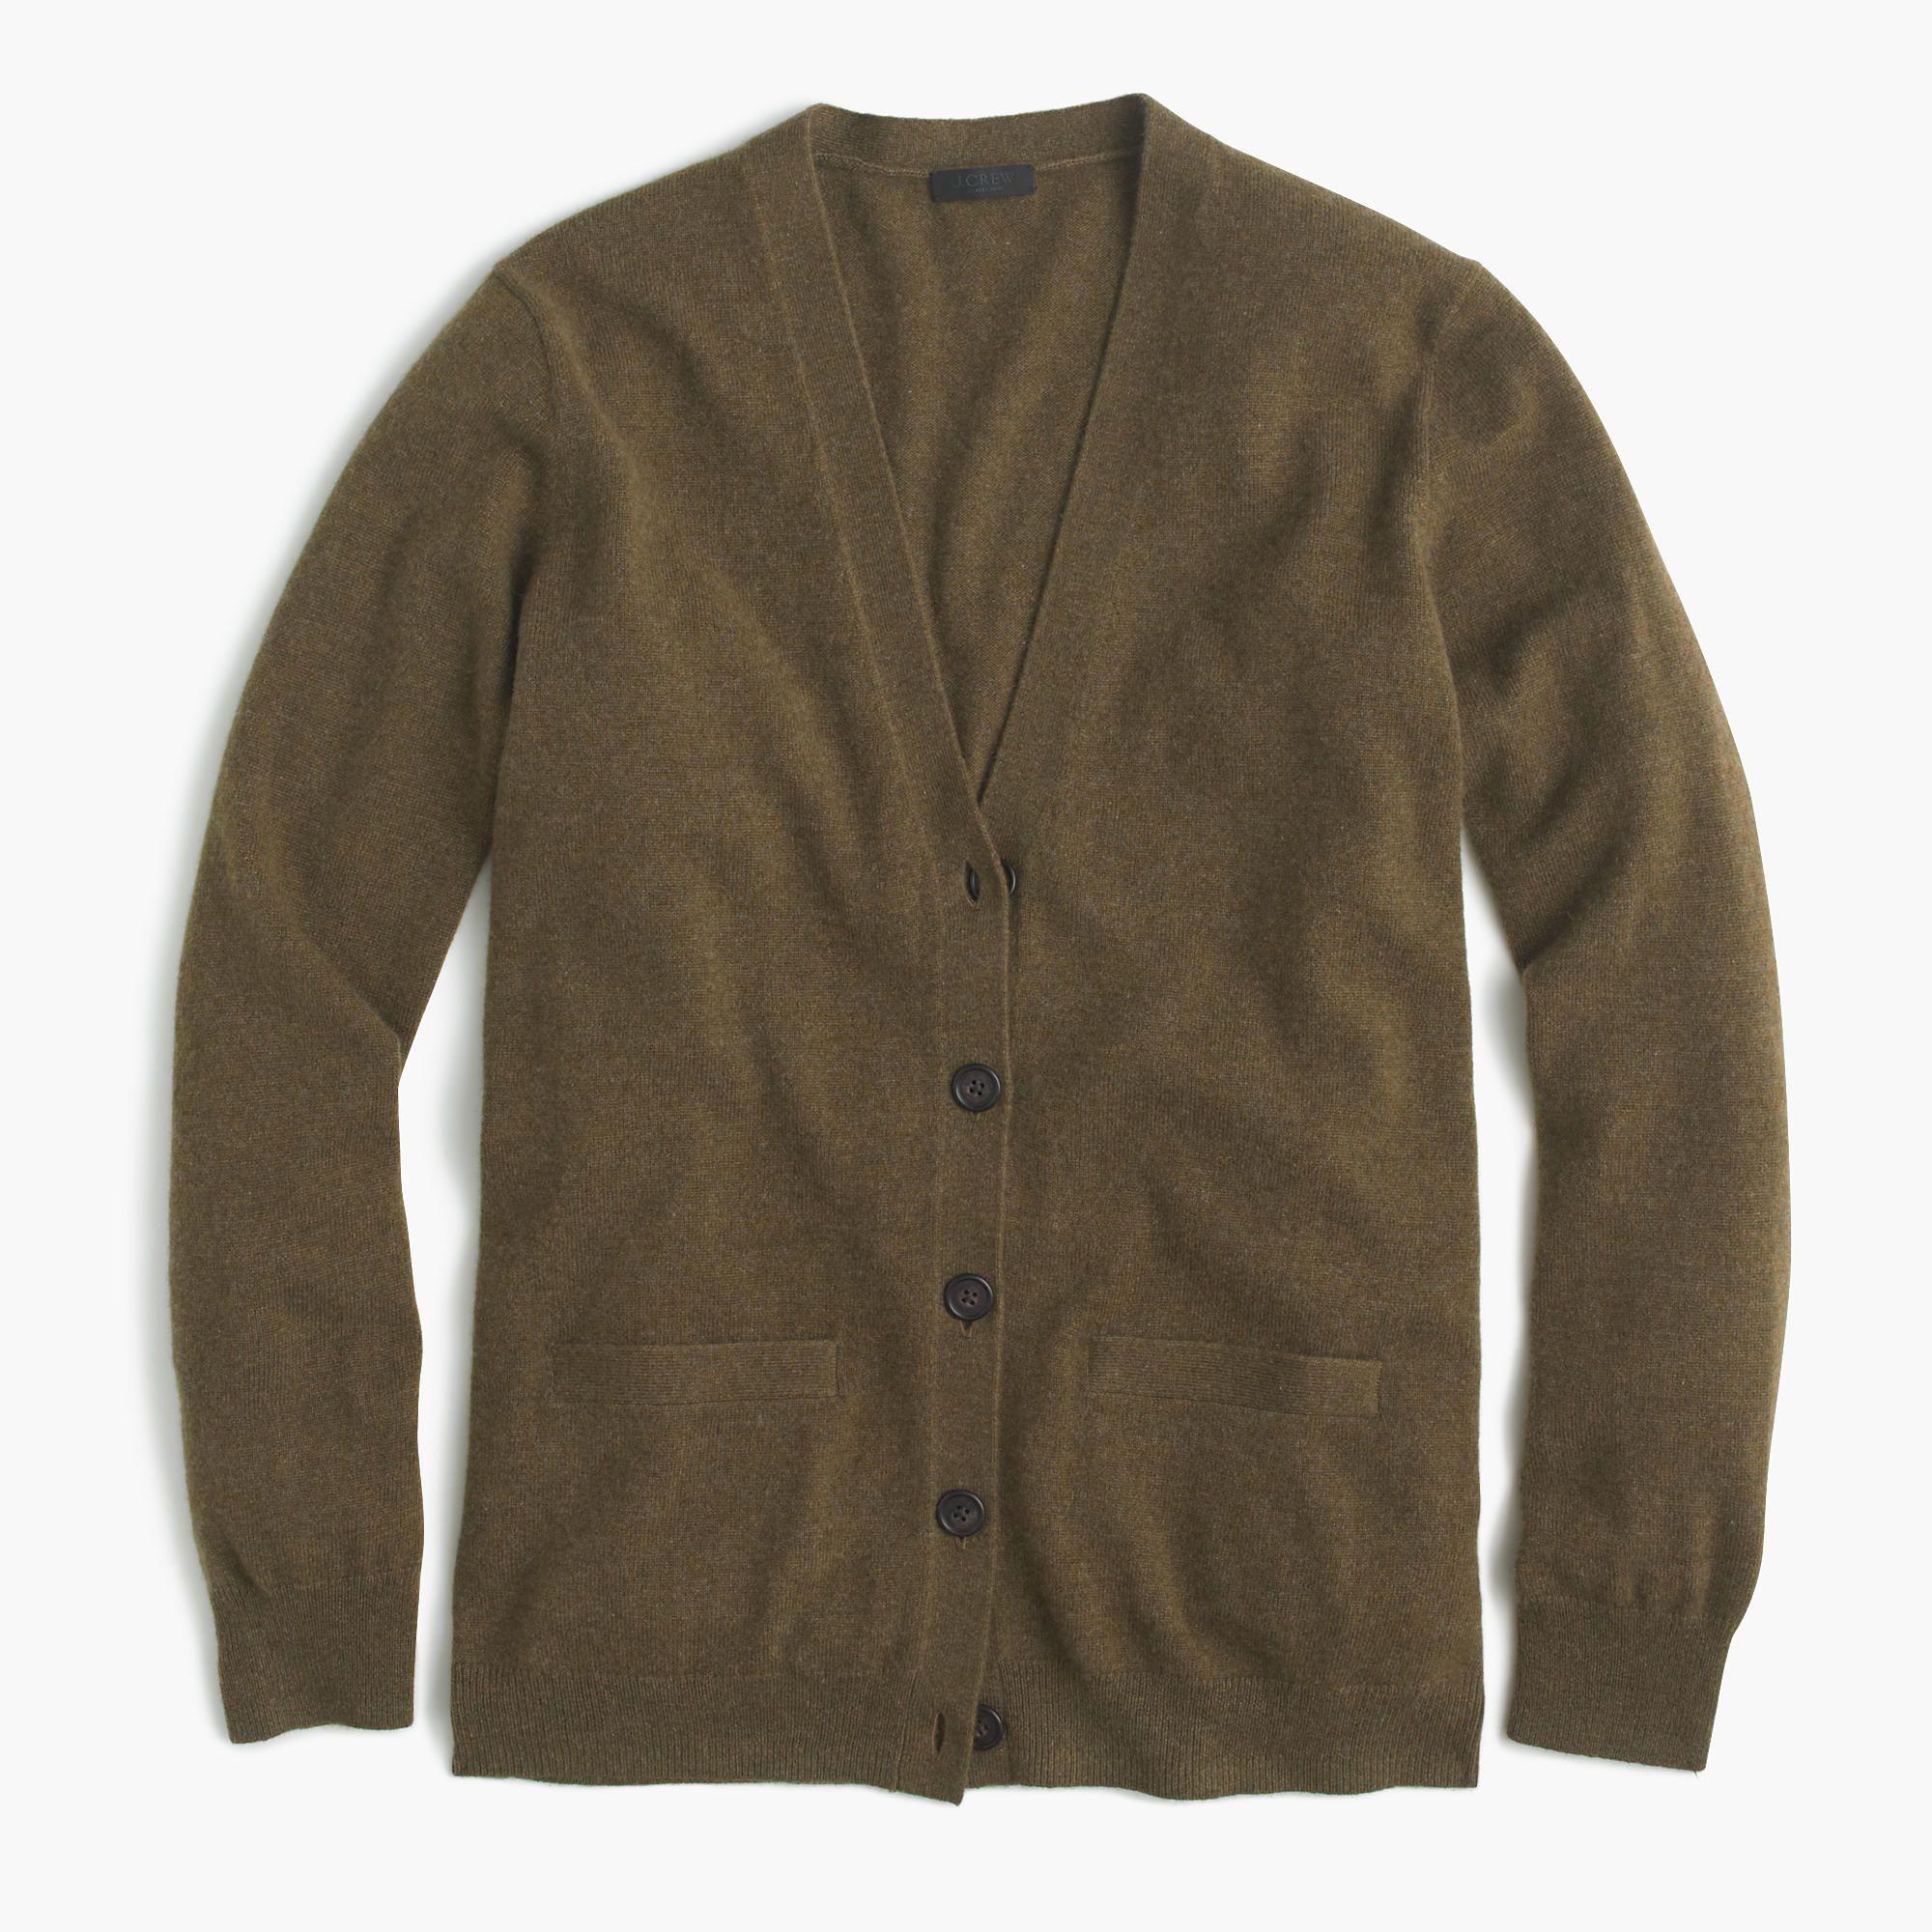 Italian cashmere boyfriend cardigan sweater | Things to wear ...